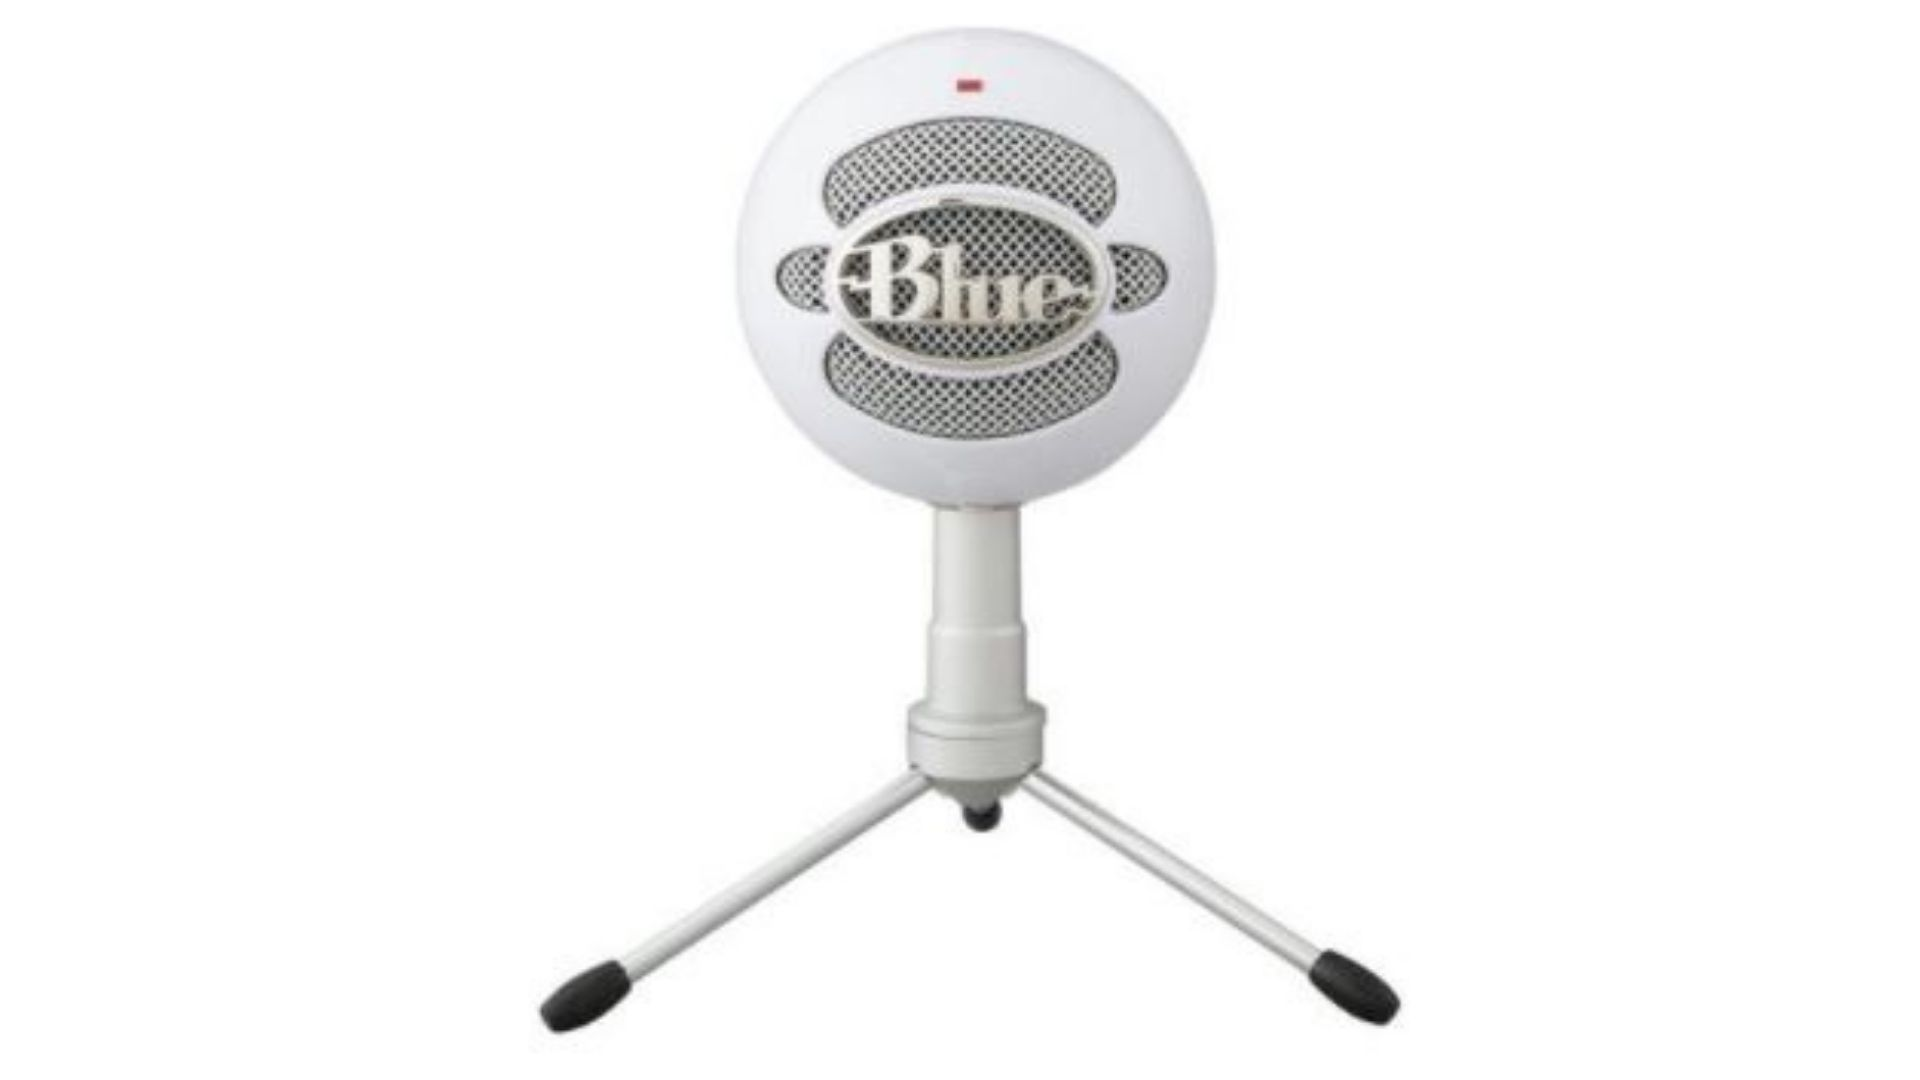 Microfone branco da empresa Blue